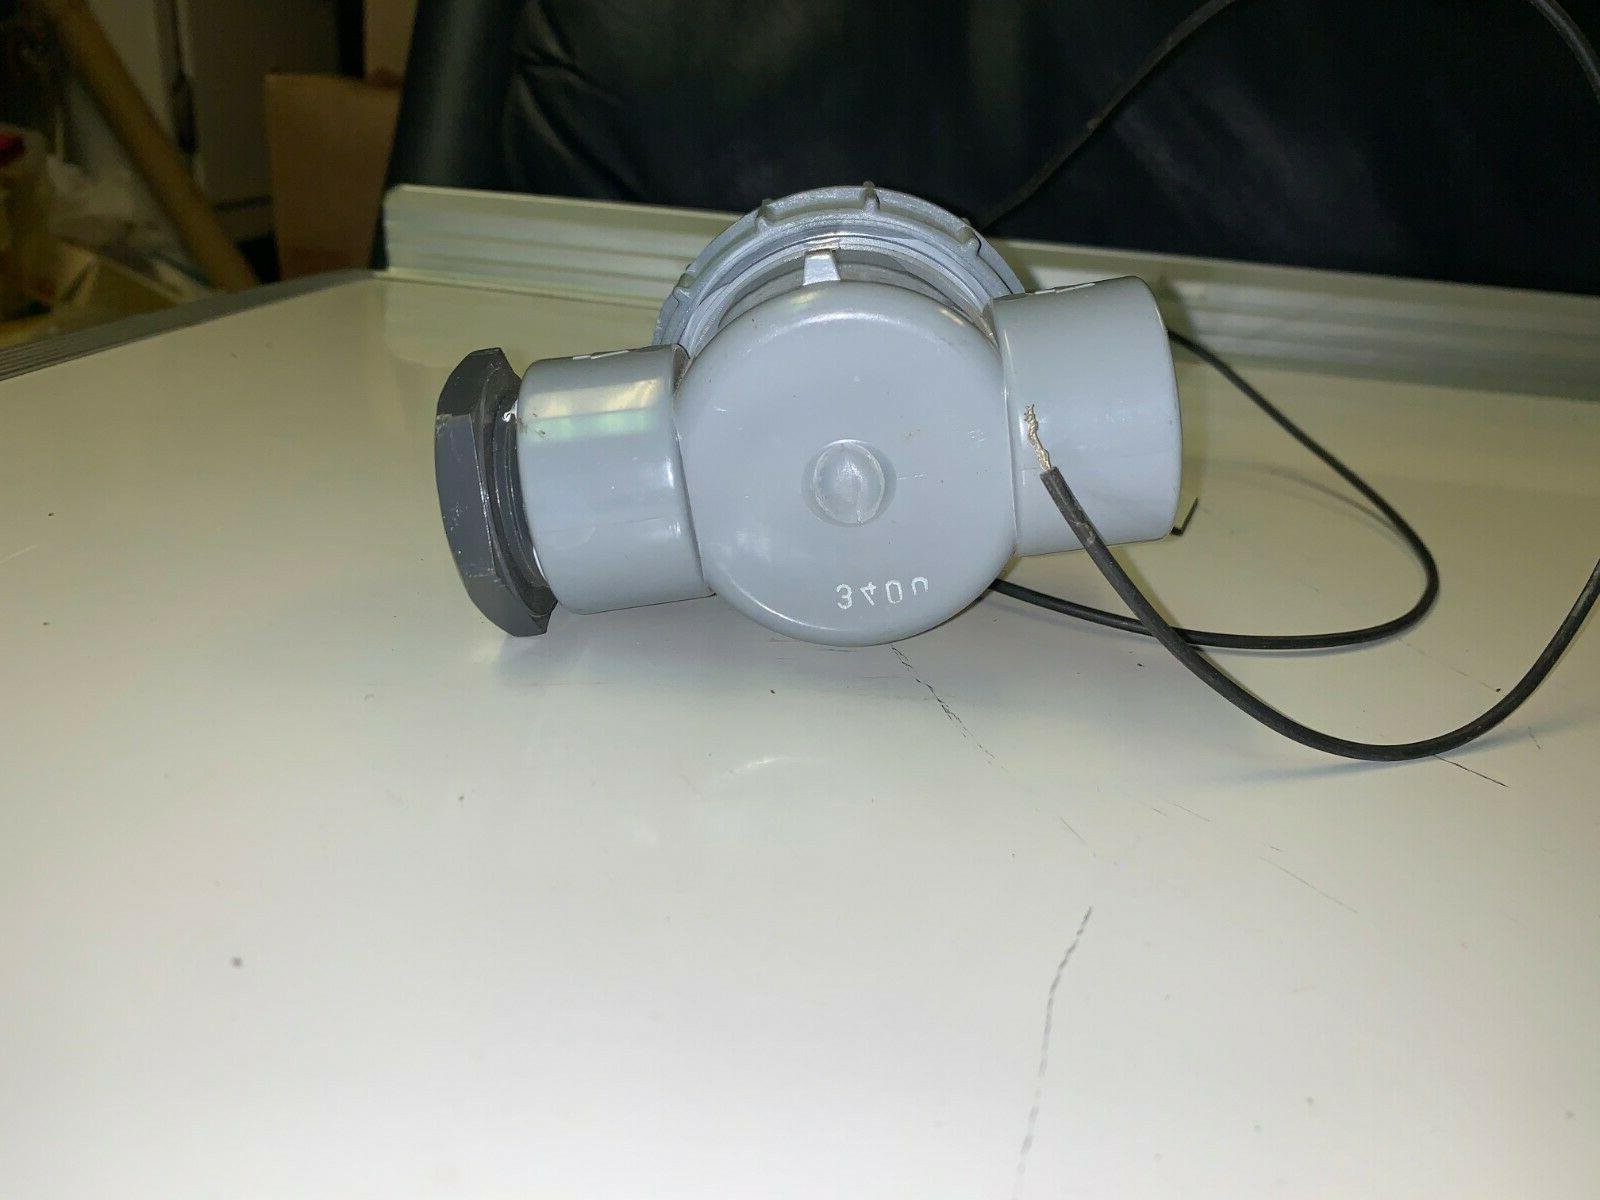 NEW! Irritrol In-Line 2400T For Sprinklers